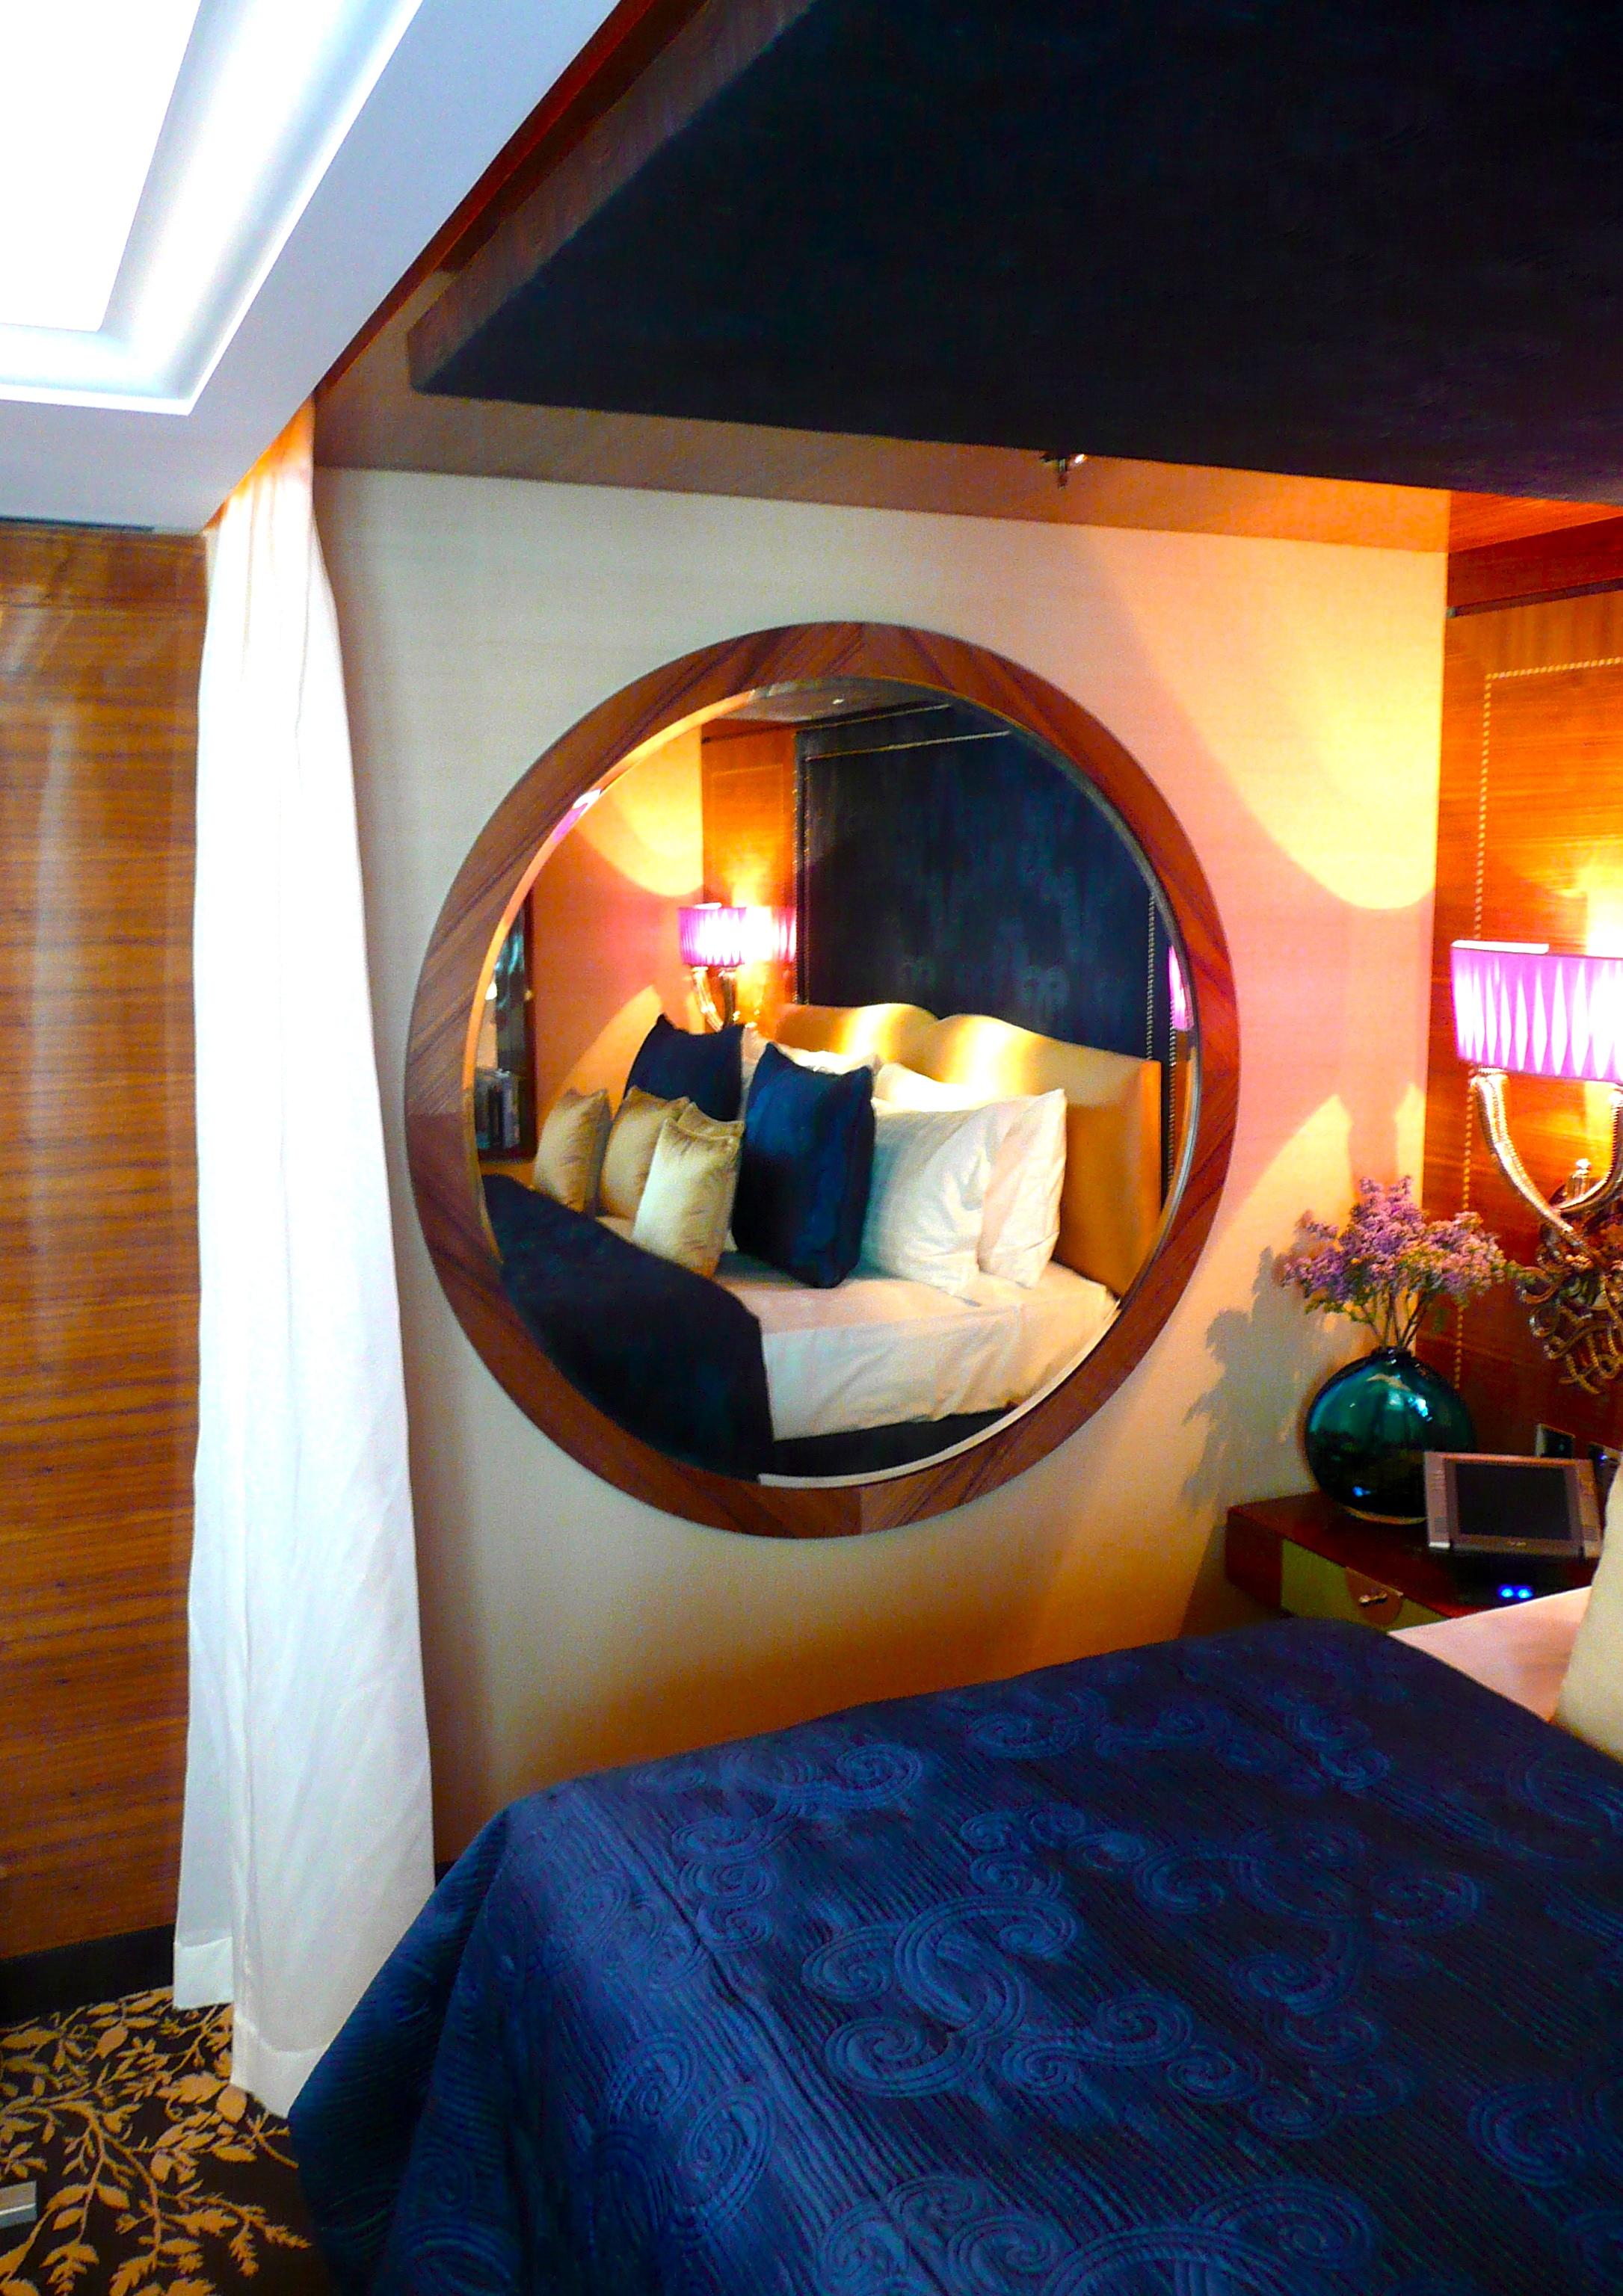 Walnut Mirror for Four Seasons, Park Lane